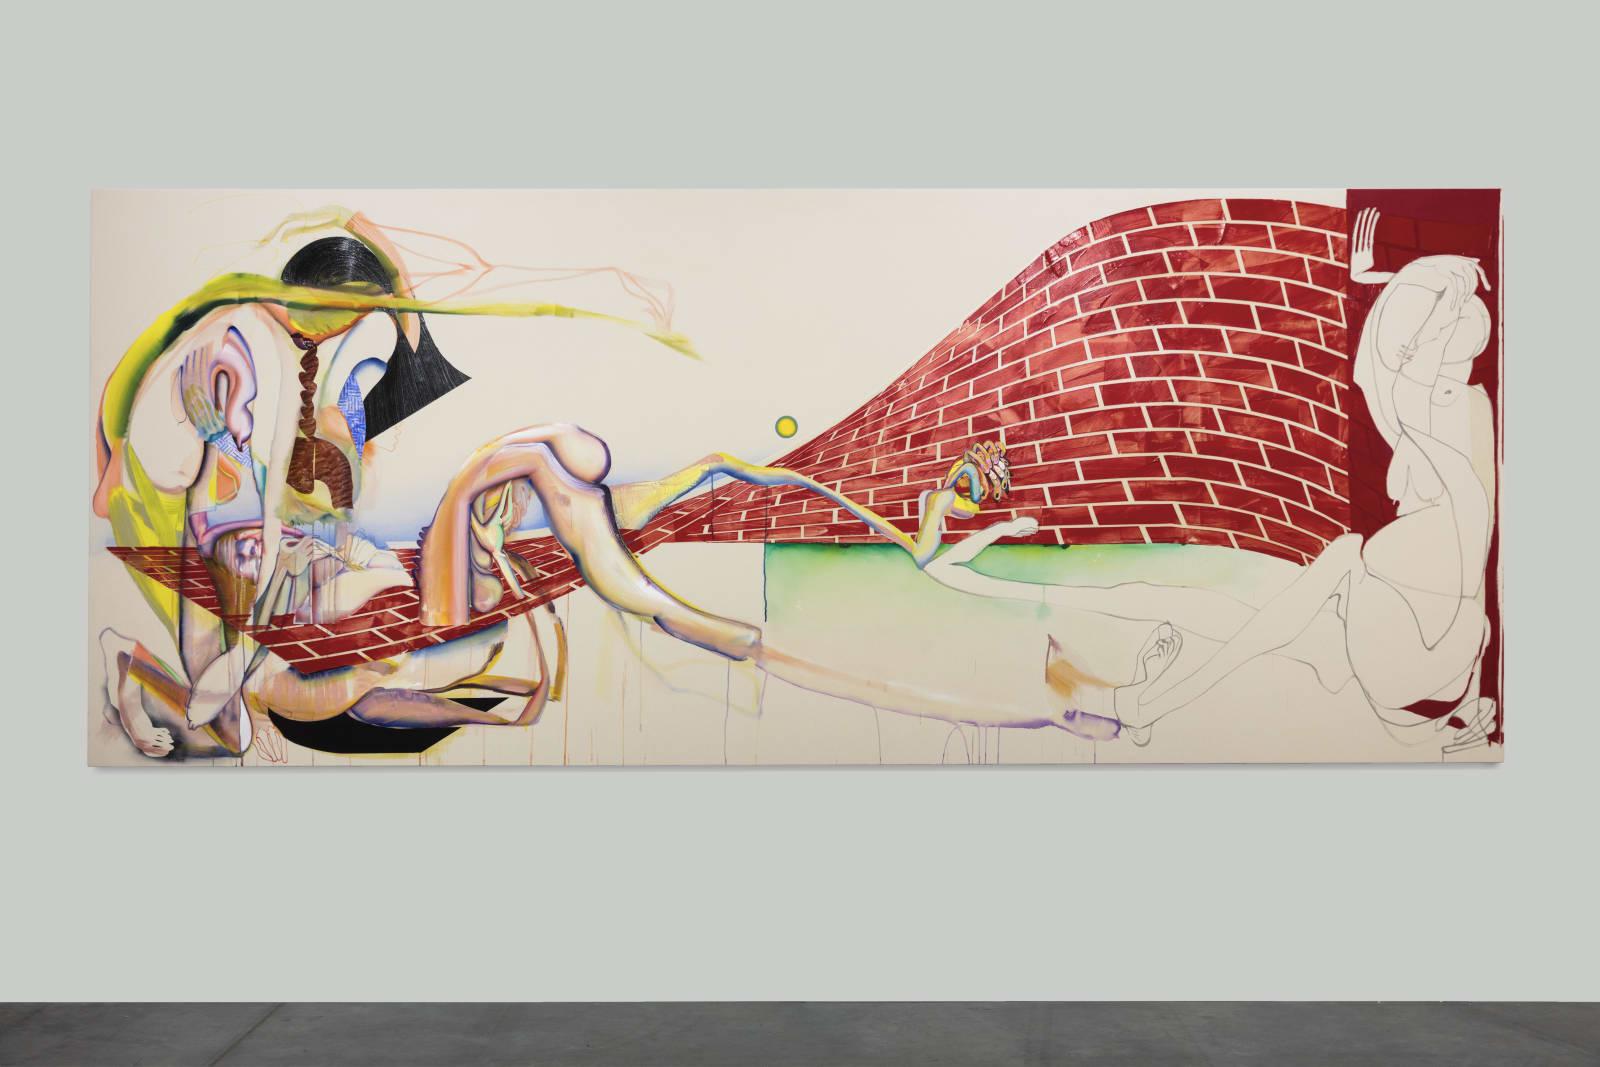 <p>Pilar Corrias Gallery, Art Basel Miami Beach, 2019</p>